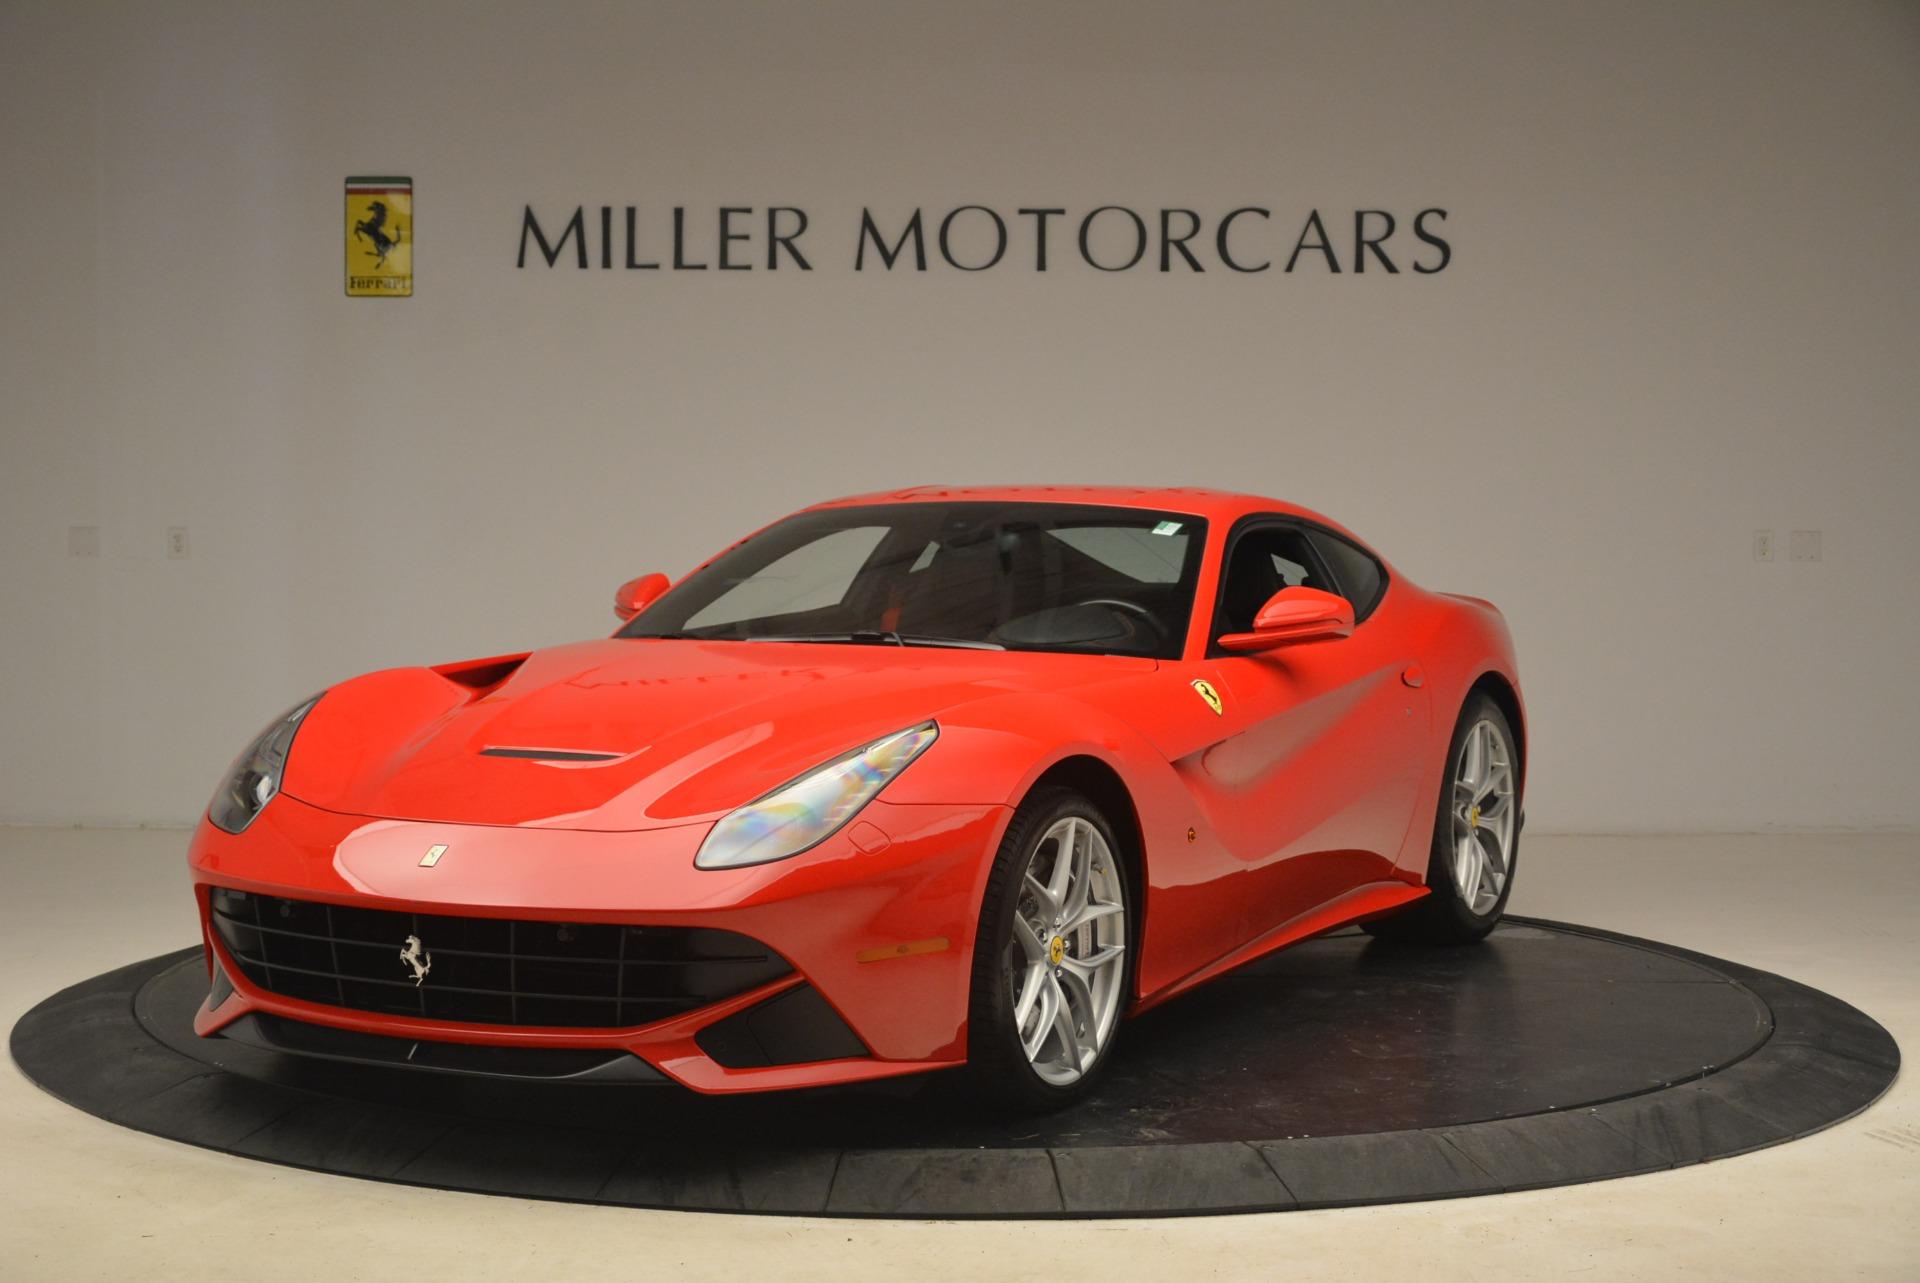 Used 2014 Ferrari F12 Berlinetta for sale Sold at Aston Martin of Greenwich in Greenwich CT 06830 1